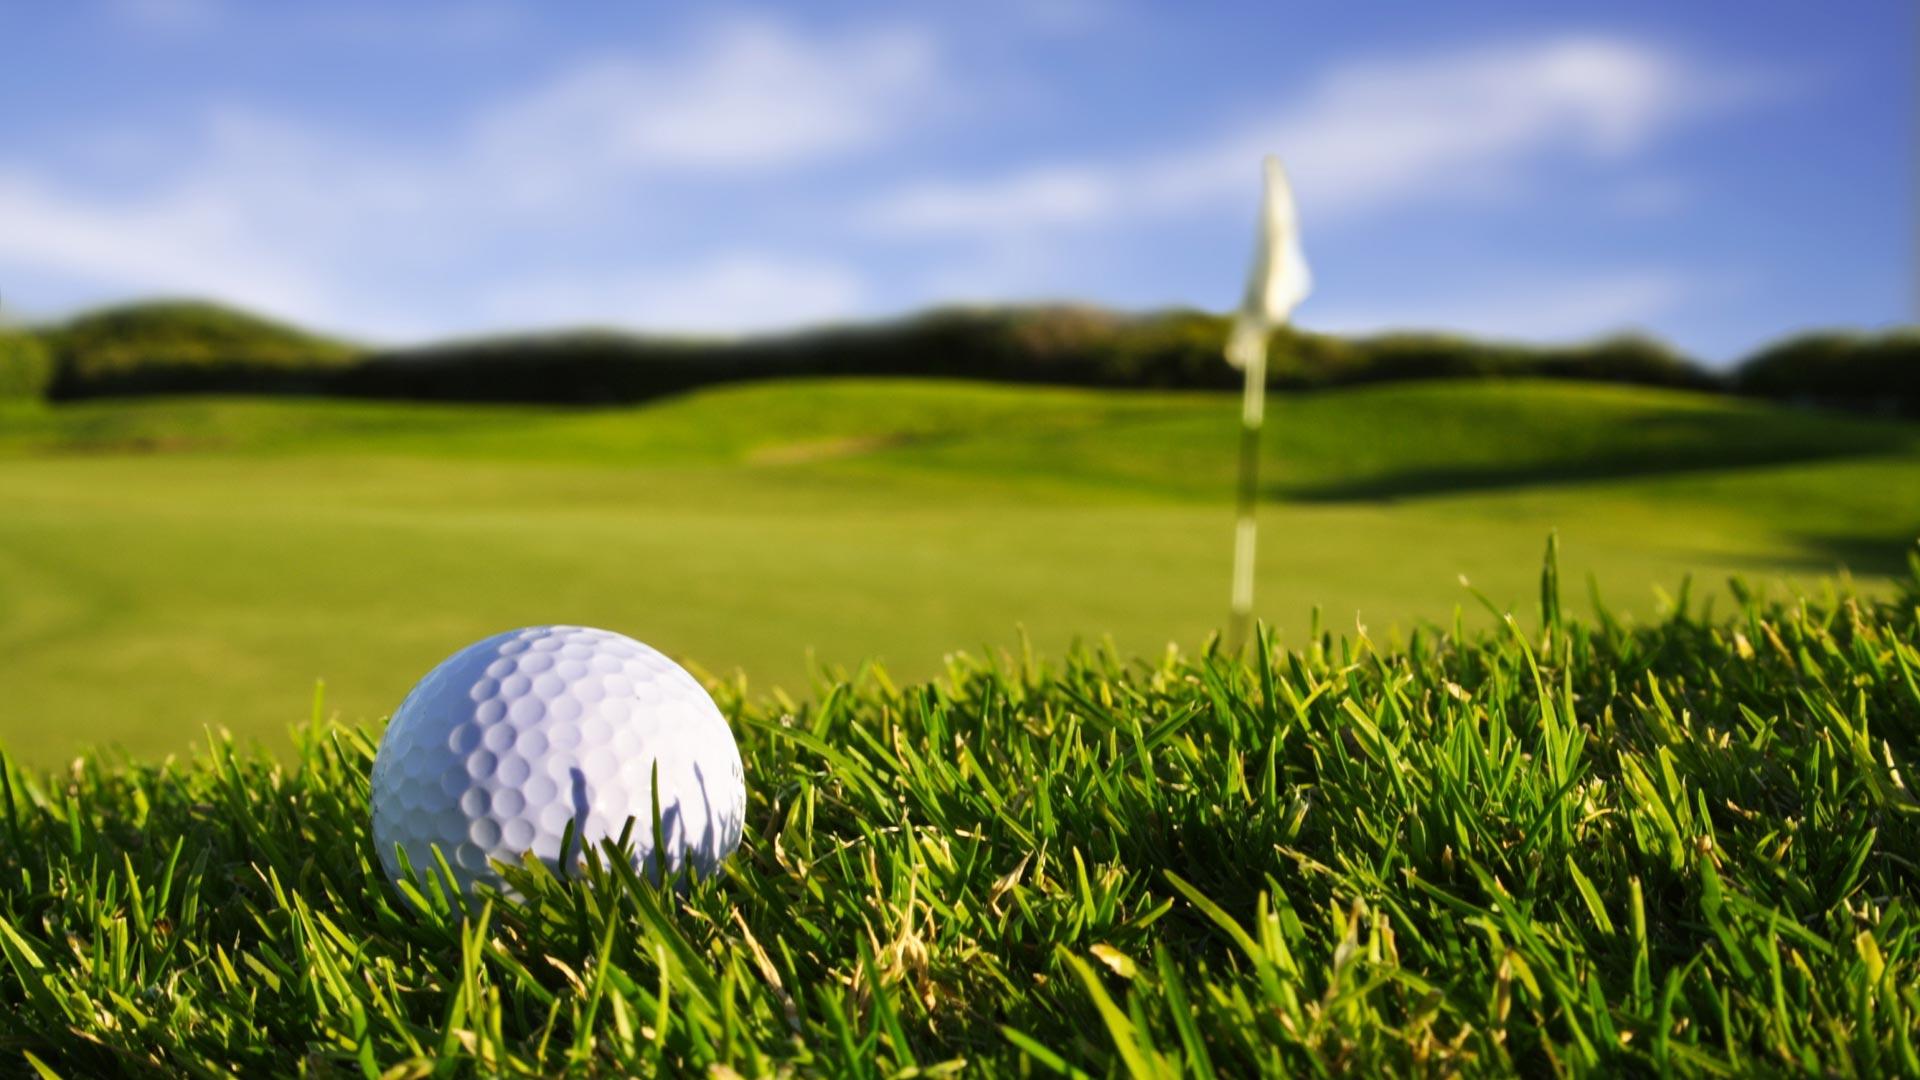 Closeup-Golf-Ball-Over-%E2%80%93-1080p-HD-for-Desktop-wallpaper-wp3604128